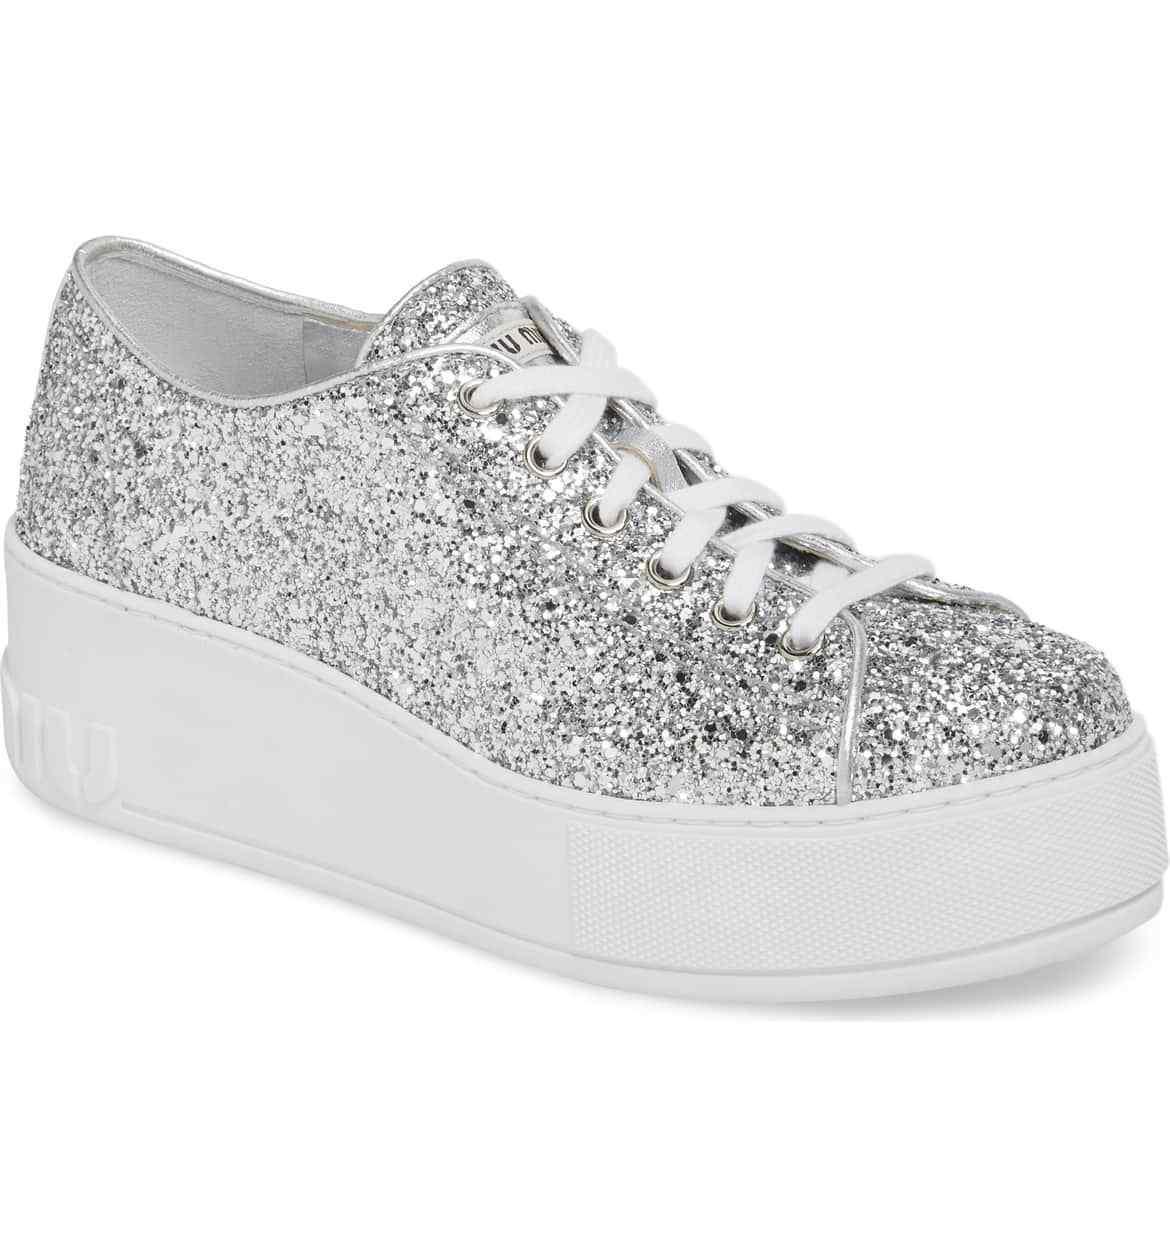 New Auth. Miu Miu Glitter Silver    Platform Sneaker 40 US 10 012d7a